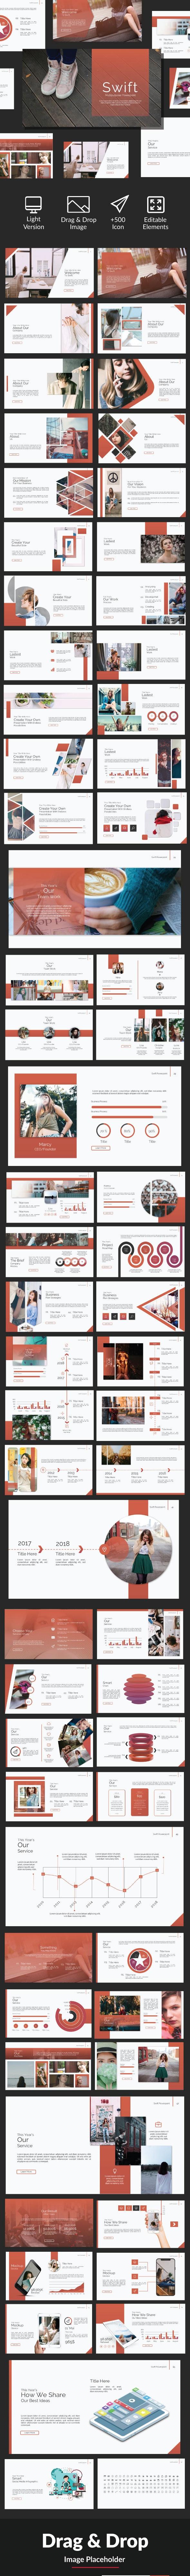 Swift Powerpoint Template - Business PowerPoint Templates